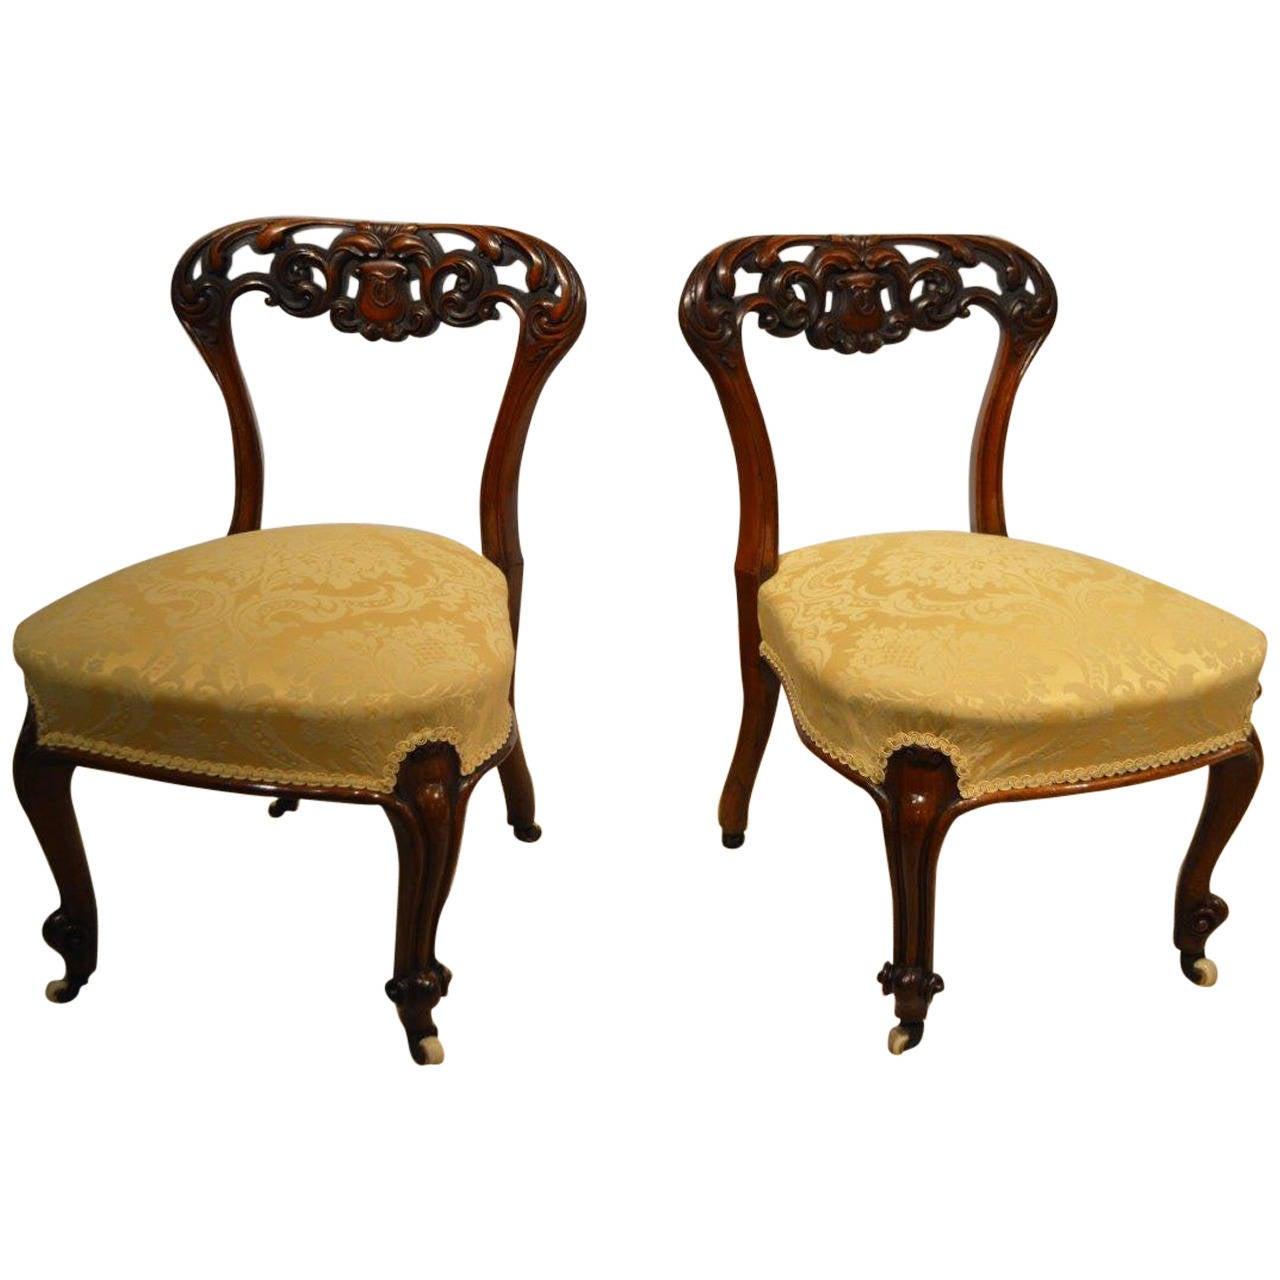 Beautiful Pair Of Small Walnut Victorian Period Nursing Chairs At 1stdibs